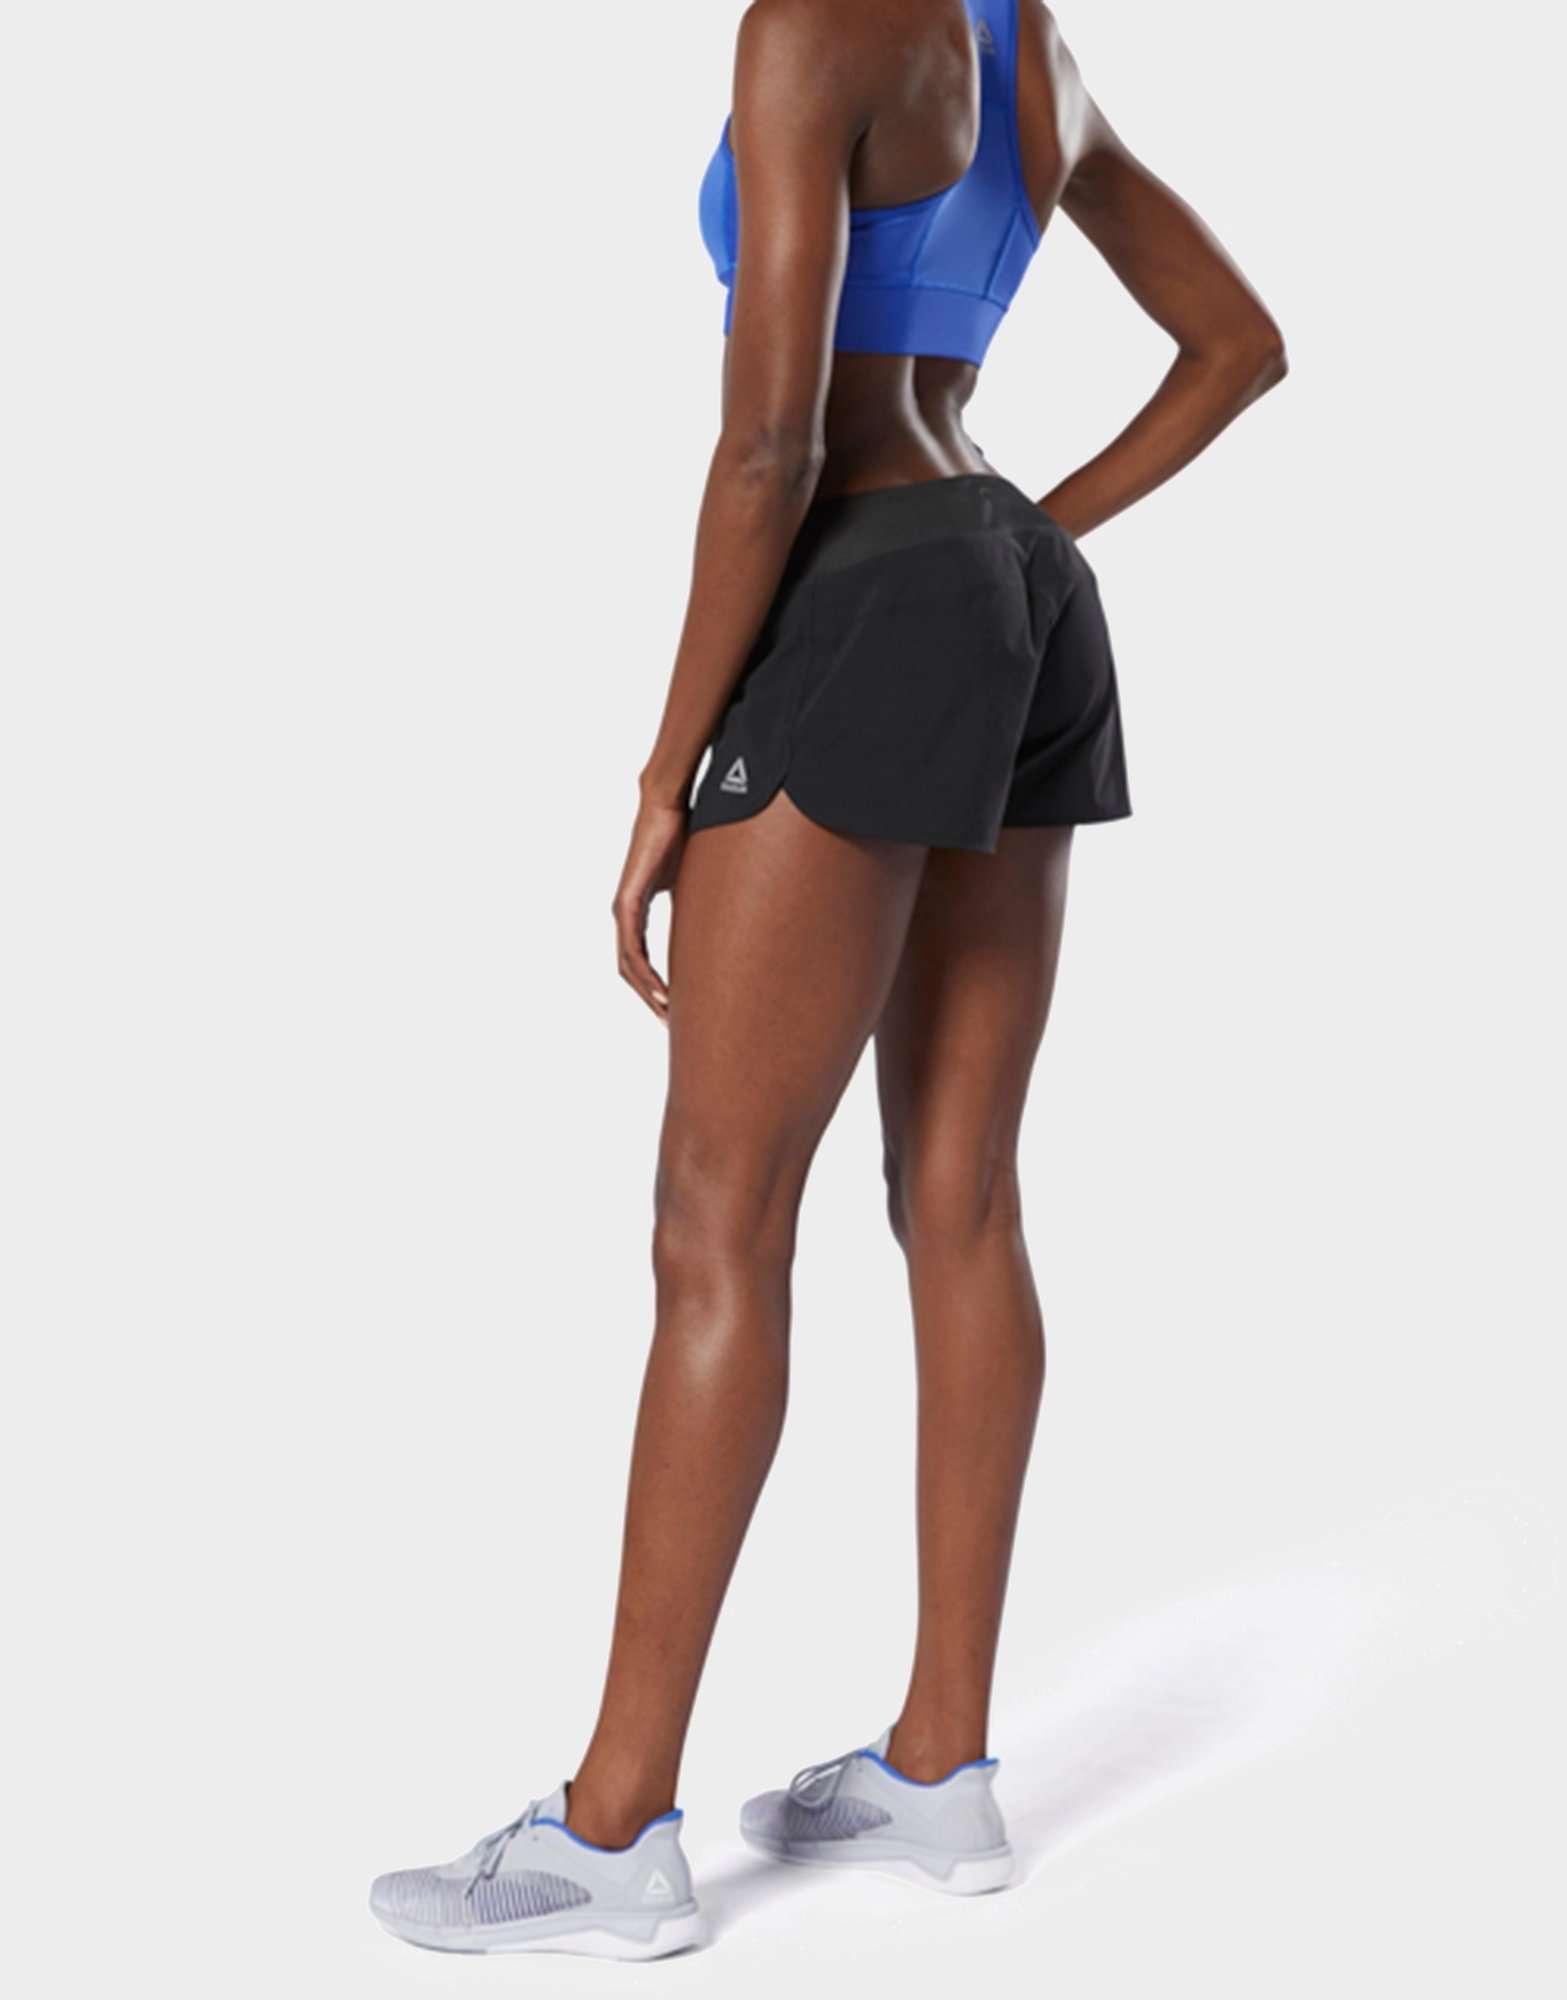 REEBOK Running Reflective Shorts